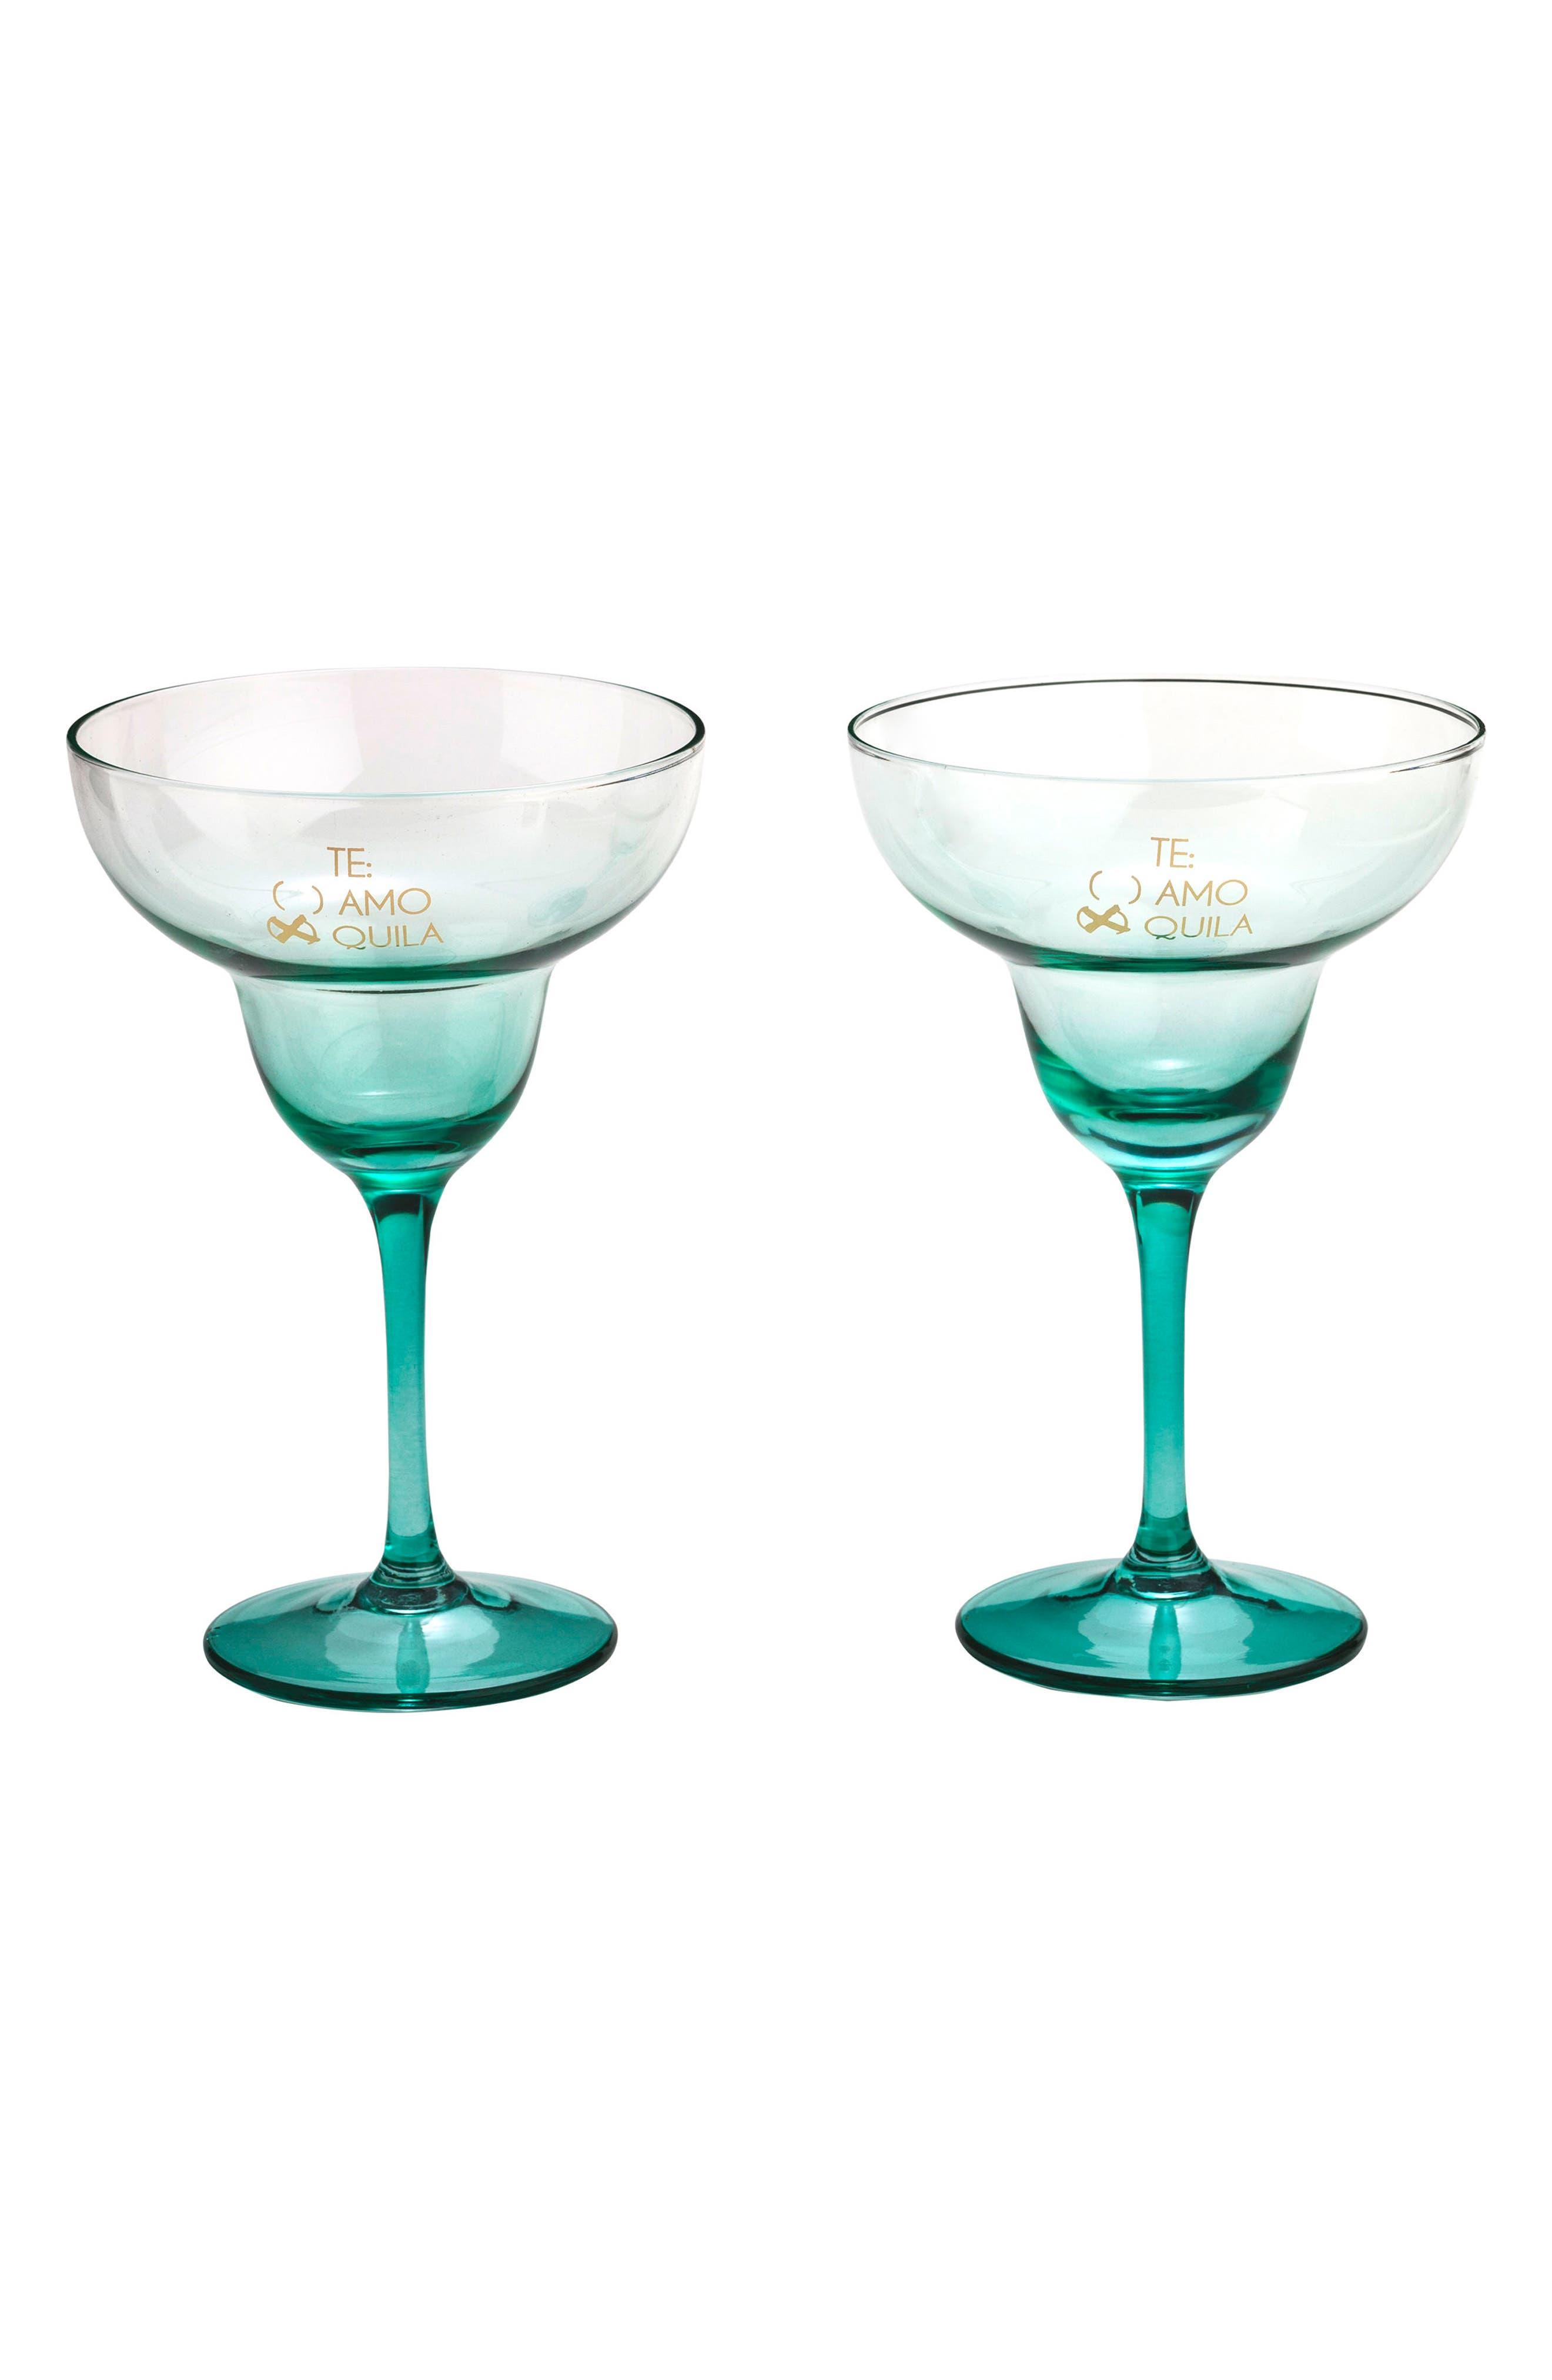 Te Amo x Quila Set of 2 Margarita Glasses,                         Main,                         color, Glass/ Gold